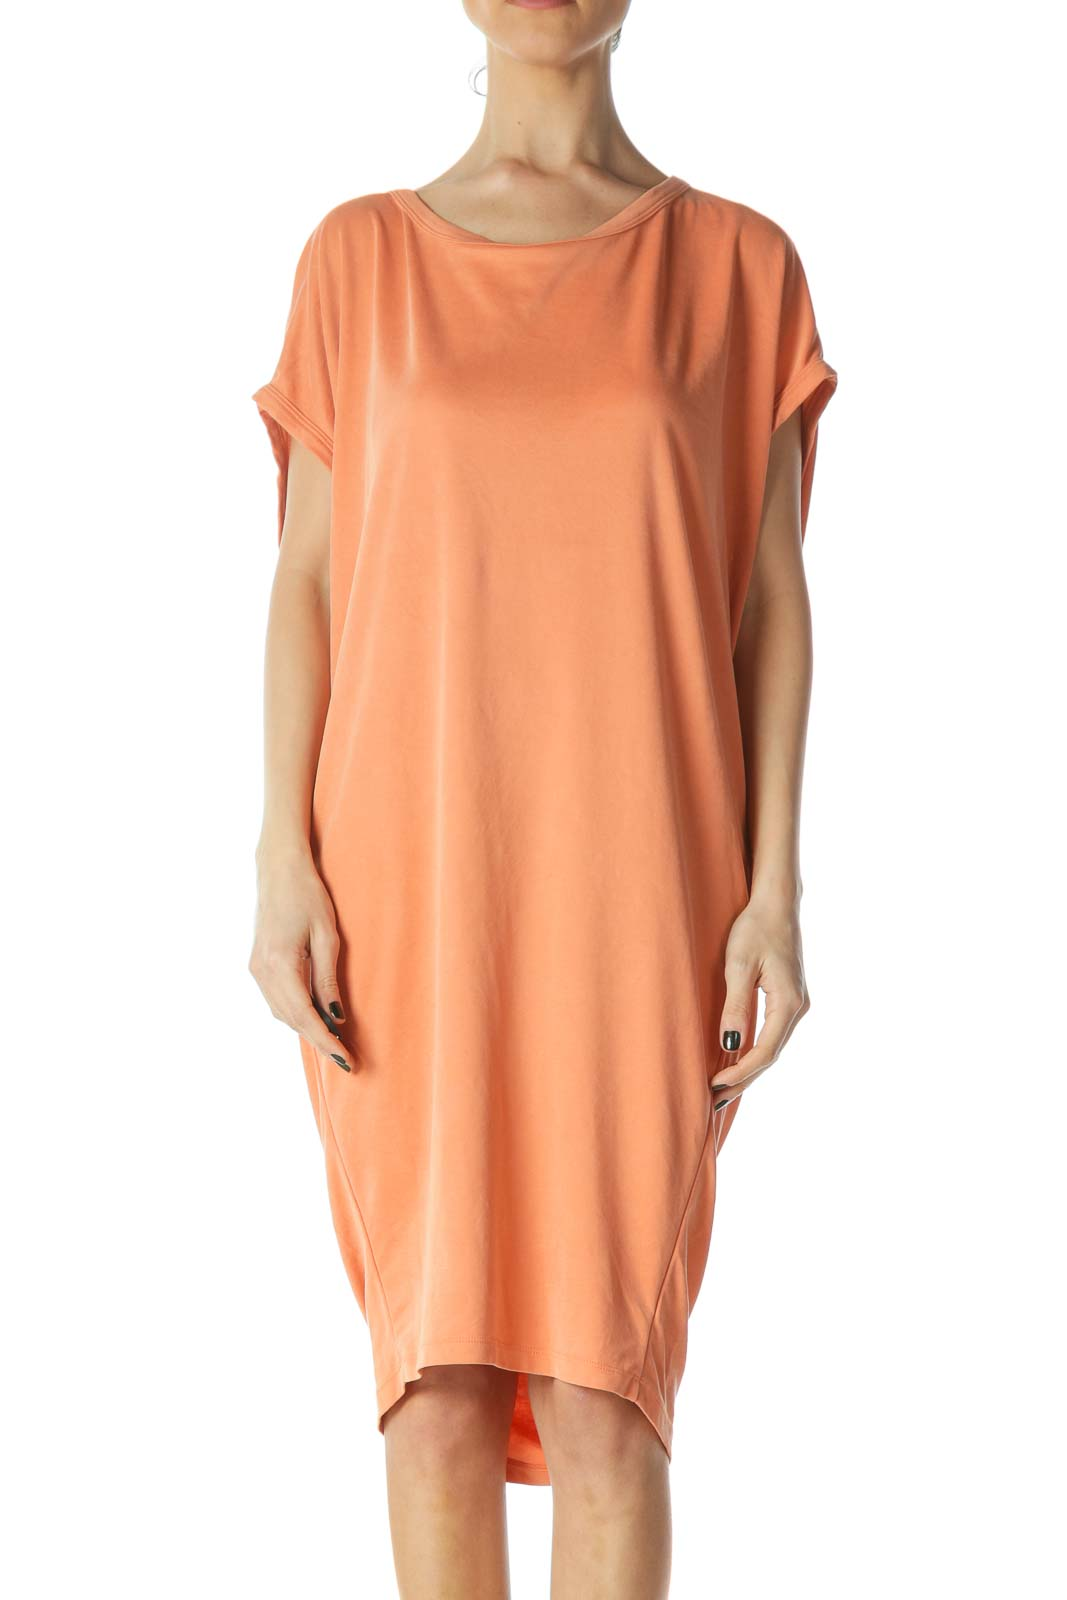 Orange Oversized Open Back Jersey Dress Front